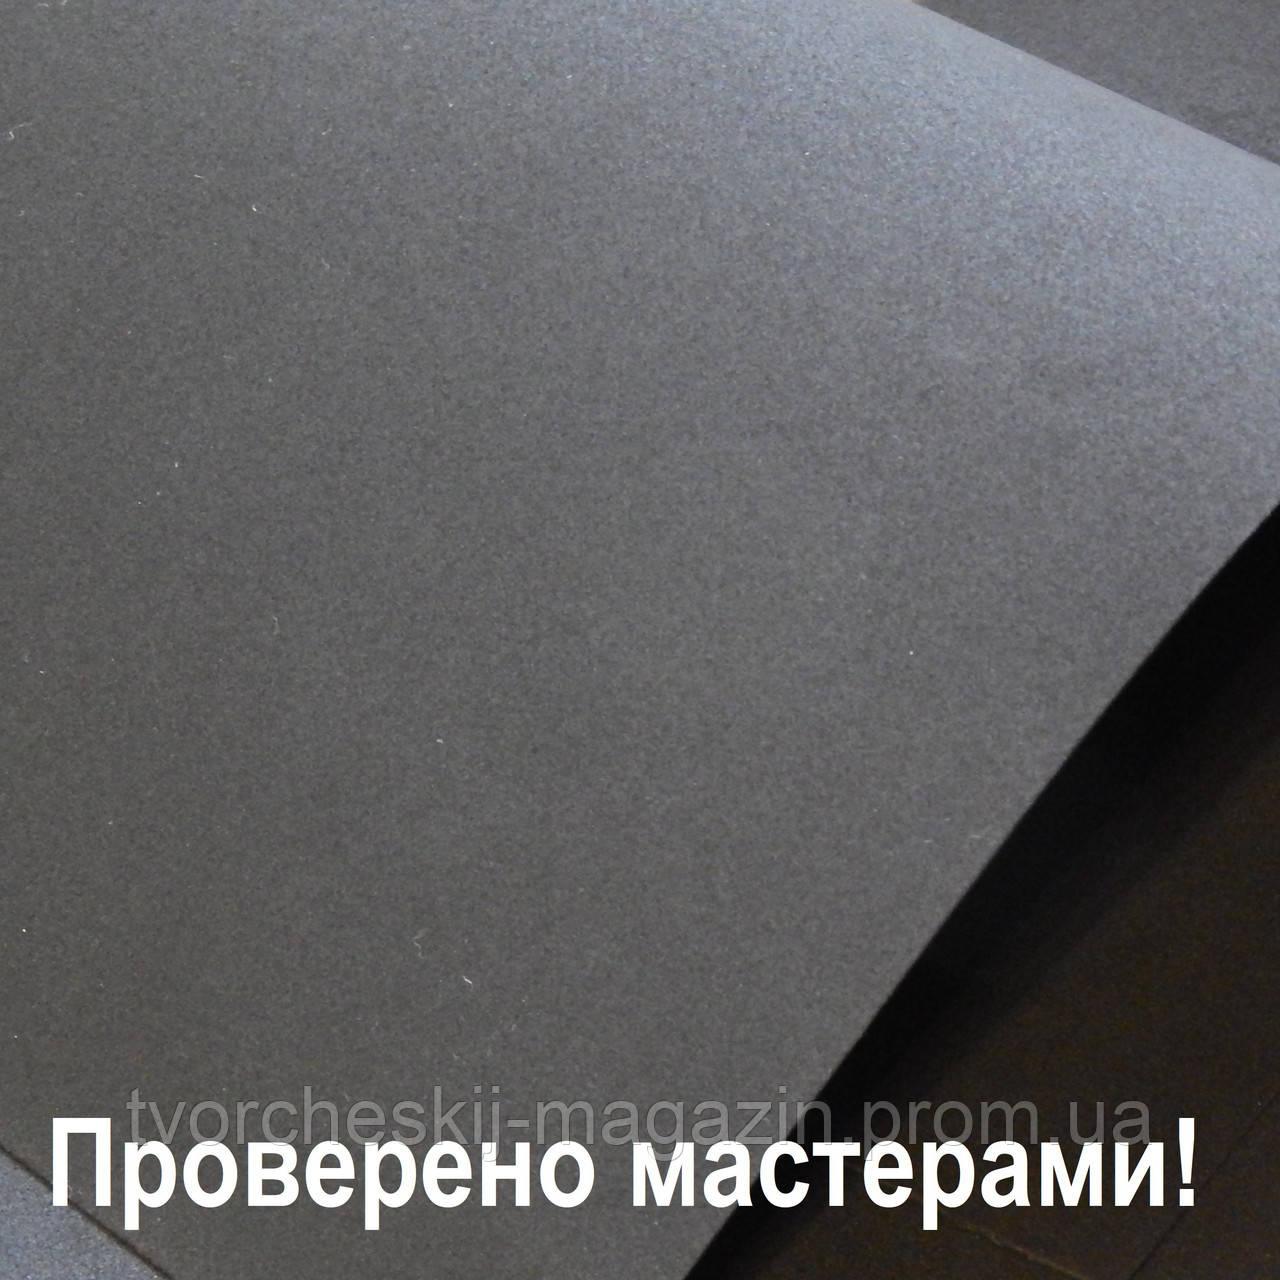 Фоамиран 0,8мм 30 х 20 см черный А4